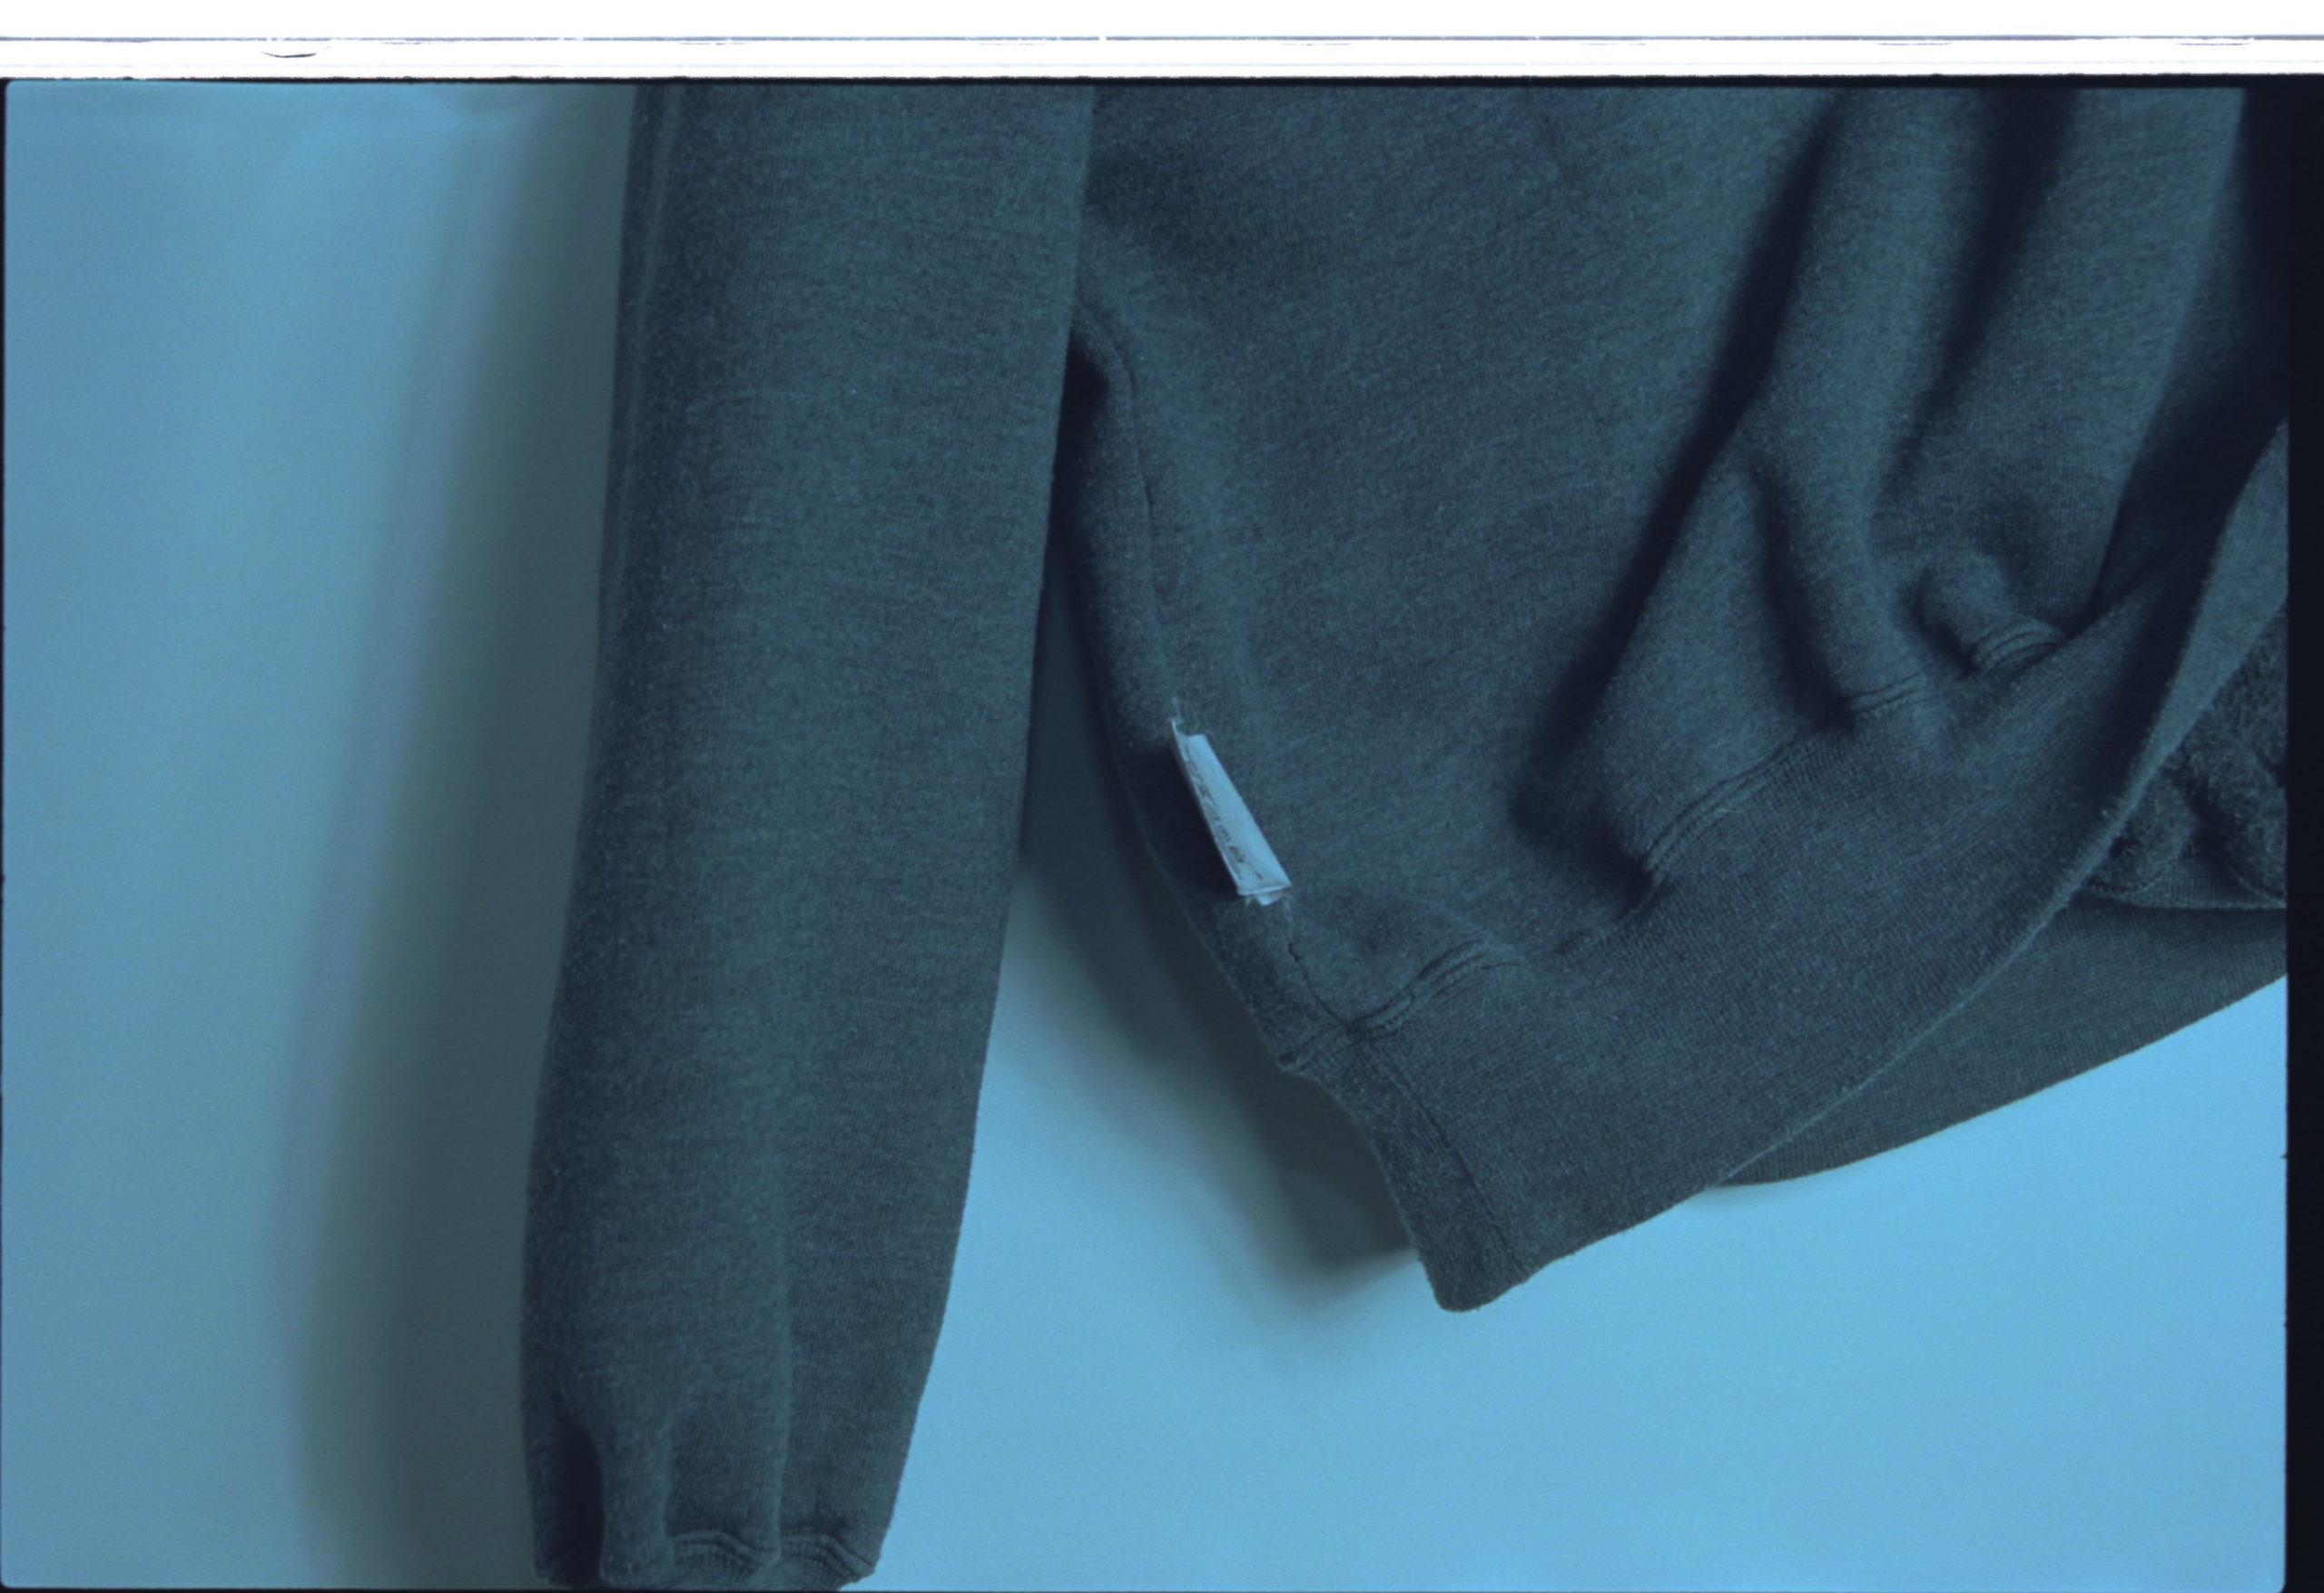 Unsharp Mask- Scanning Analog Film with the Epson Perfection v550 Photo Scanner - FilterGrade